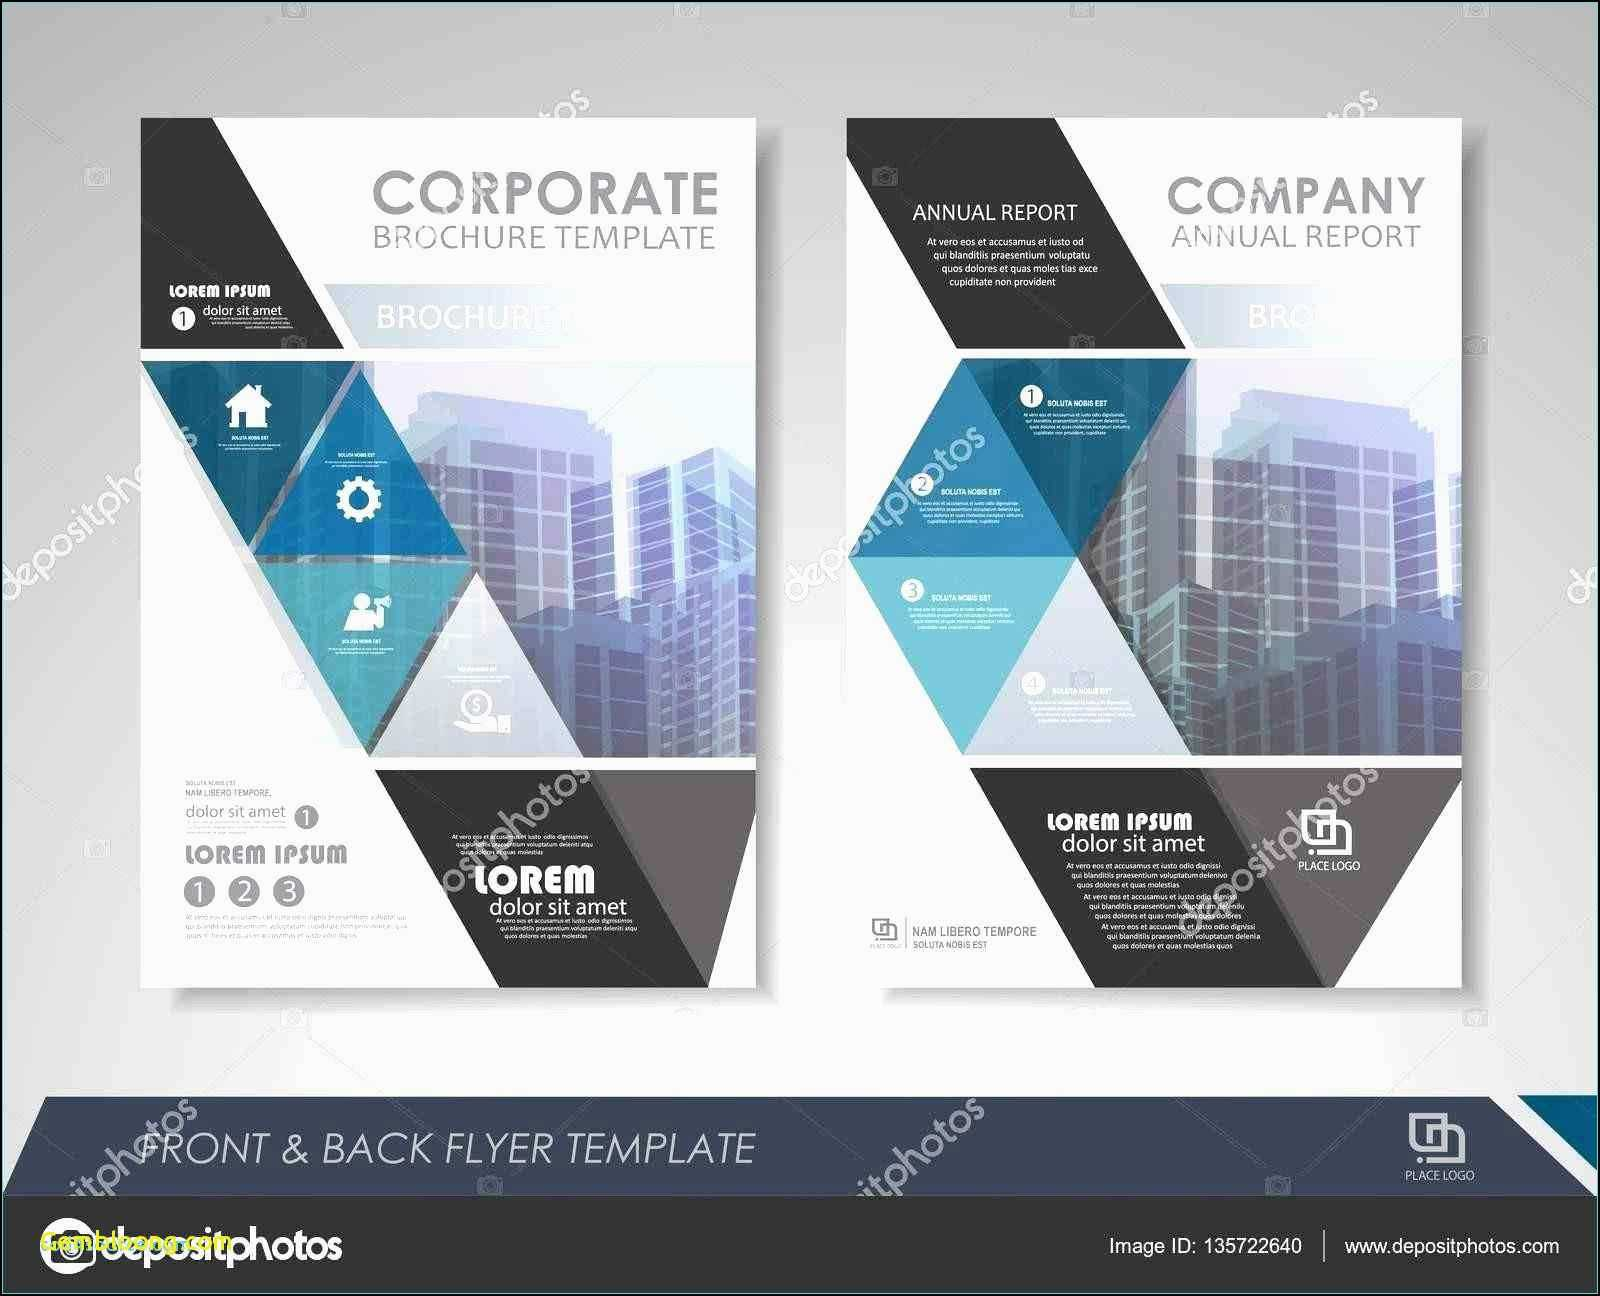 Unique 28 A4 Tri Fold Brochure Template Psd Free Download pertaining to Tri Fold Brochure Template Indesign Free Download